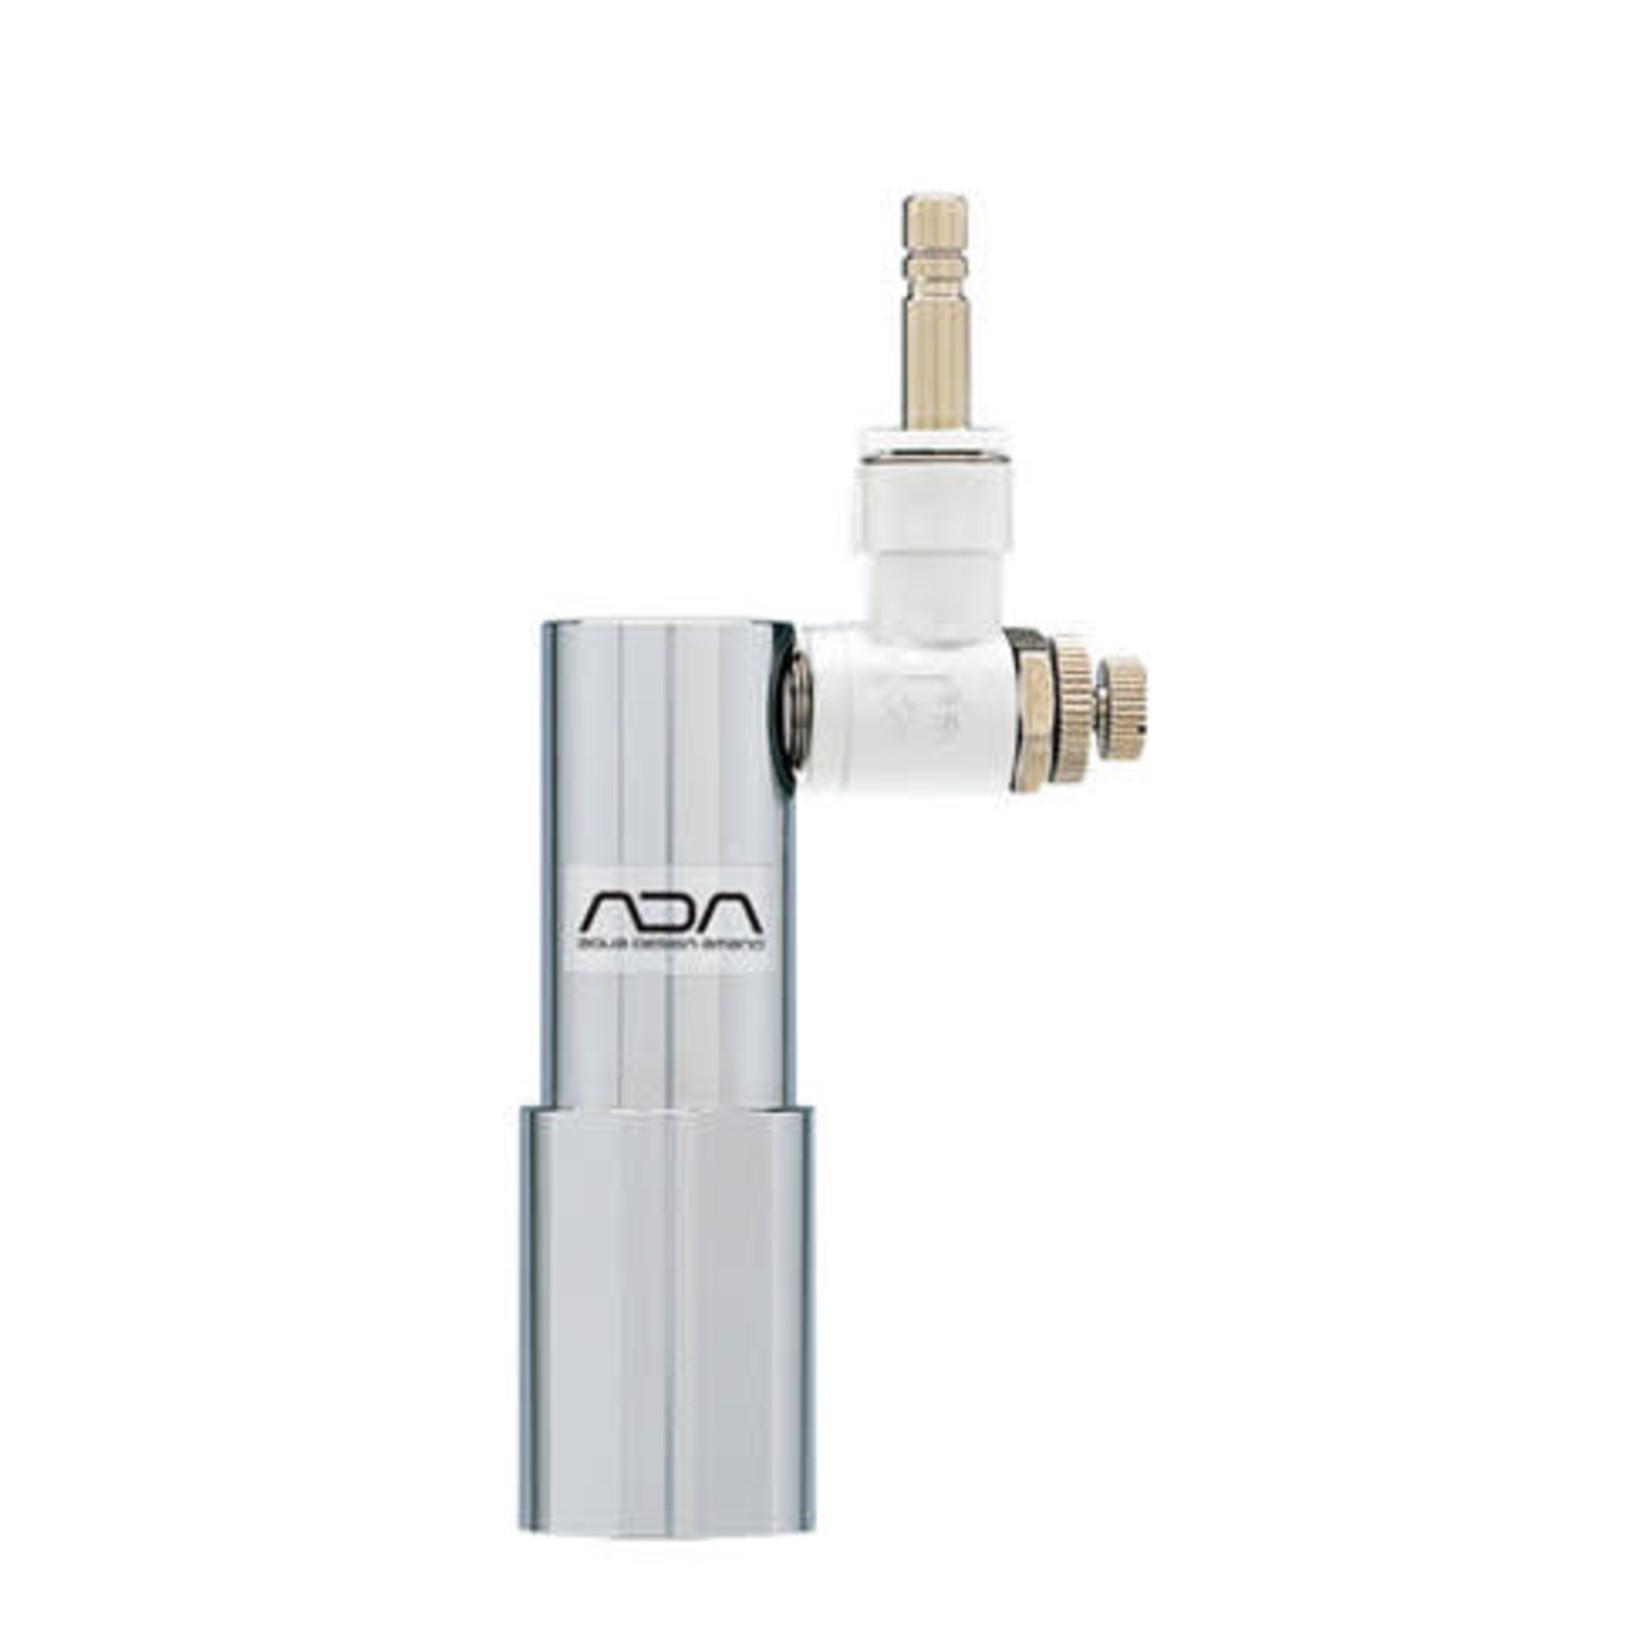 ADA CO2 System 74-YA/Ver.2 for disposable bottles